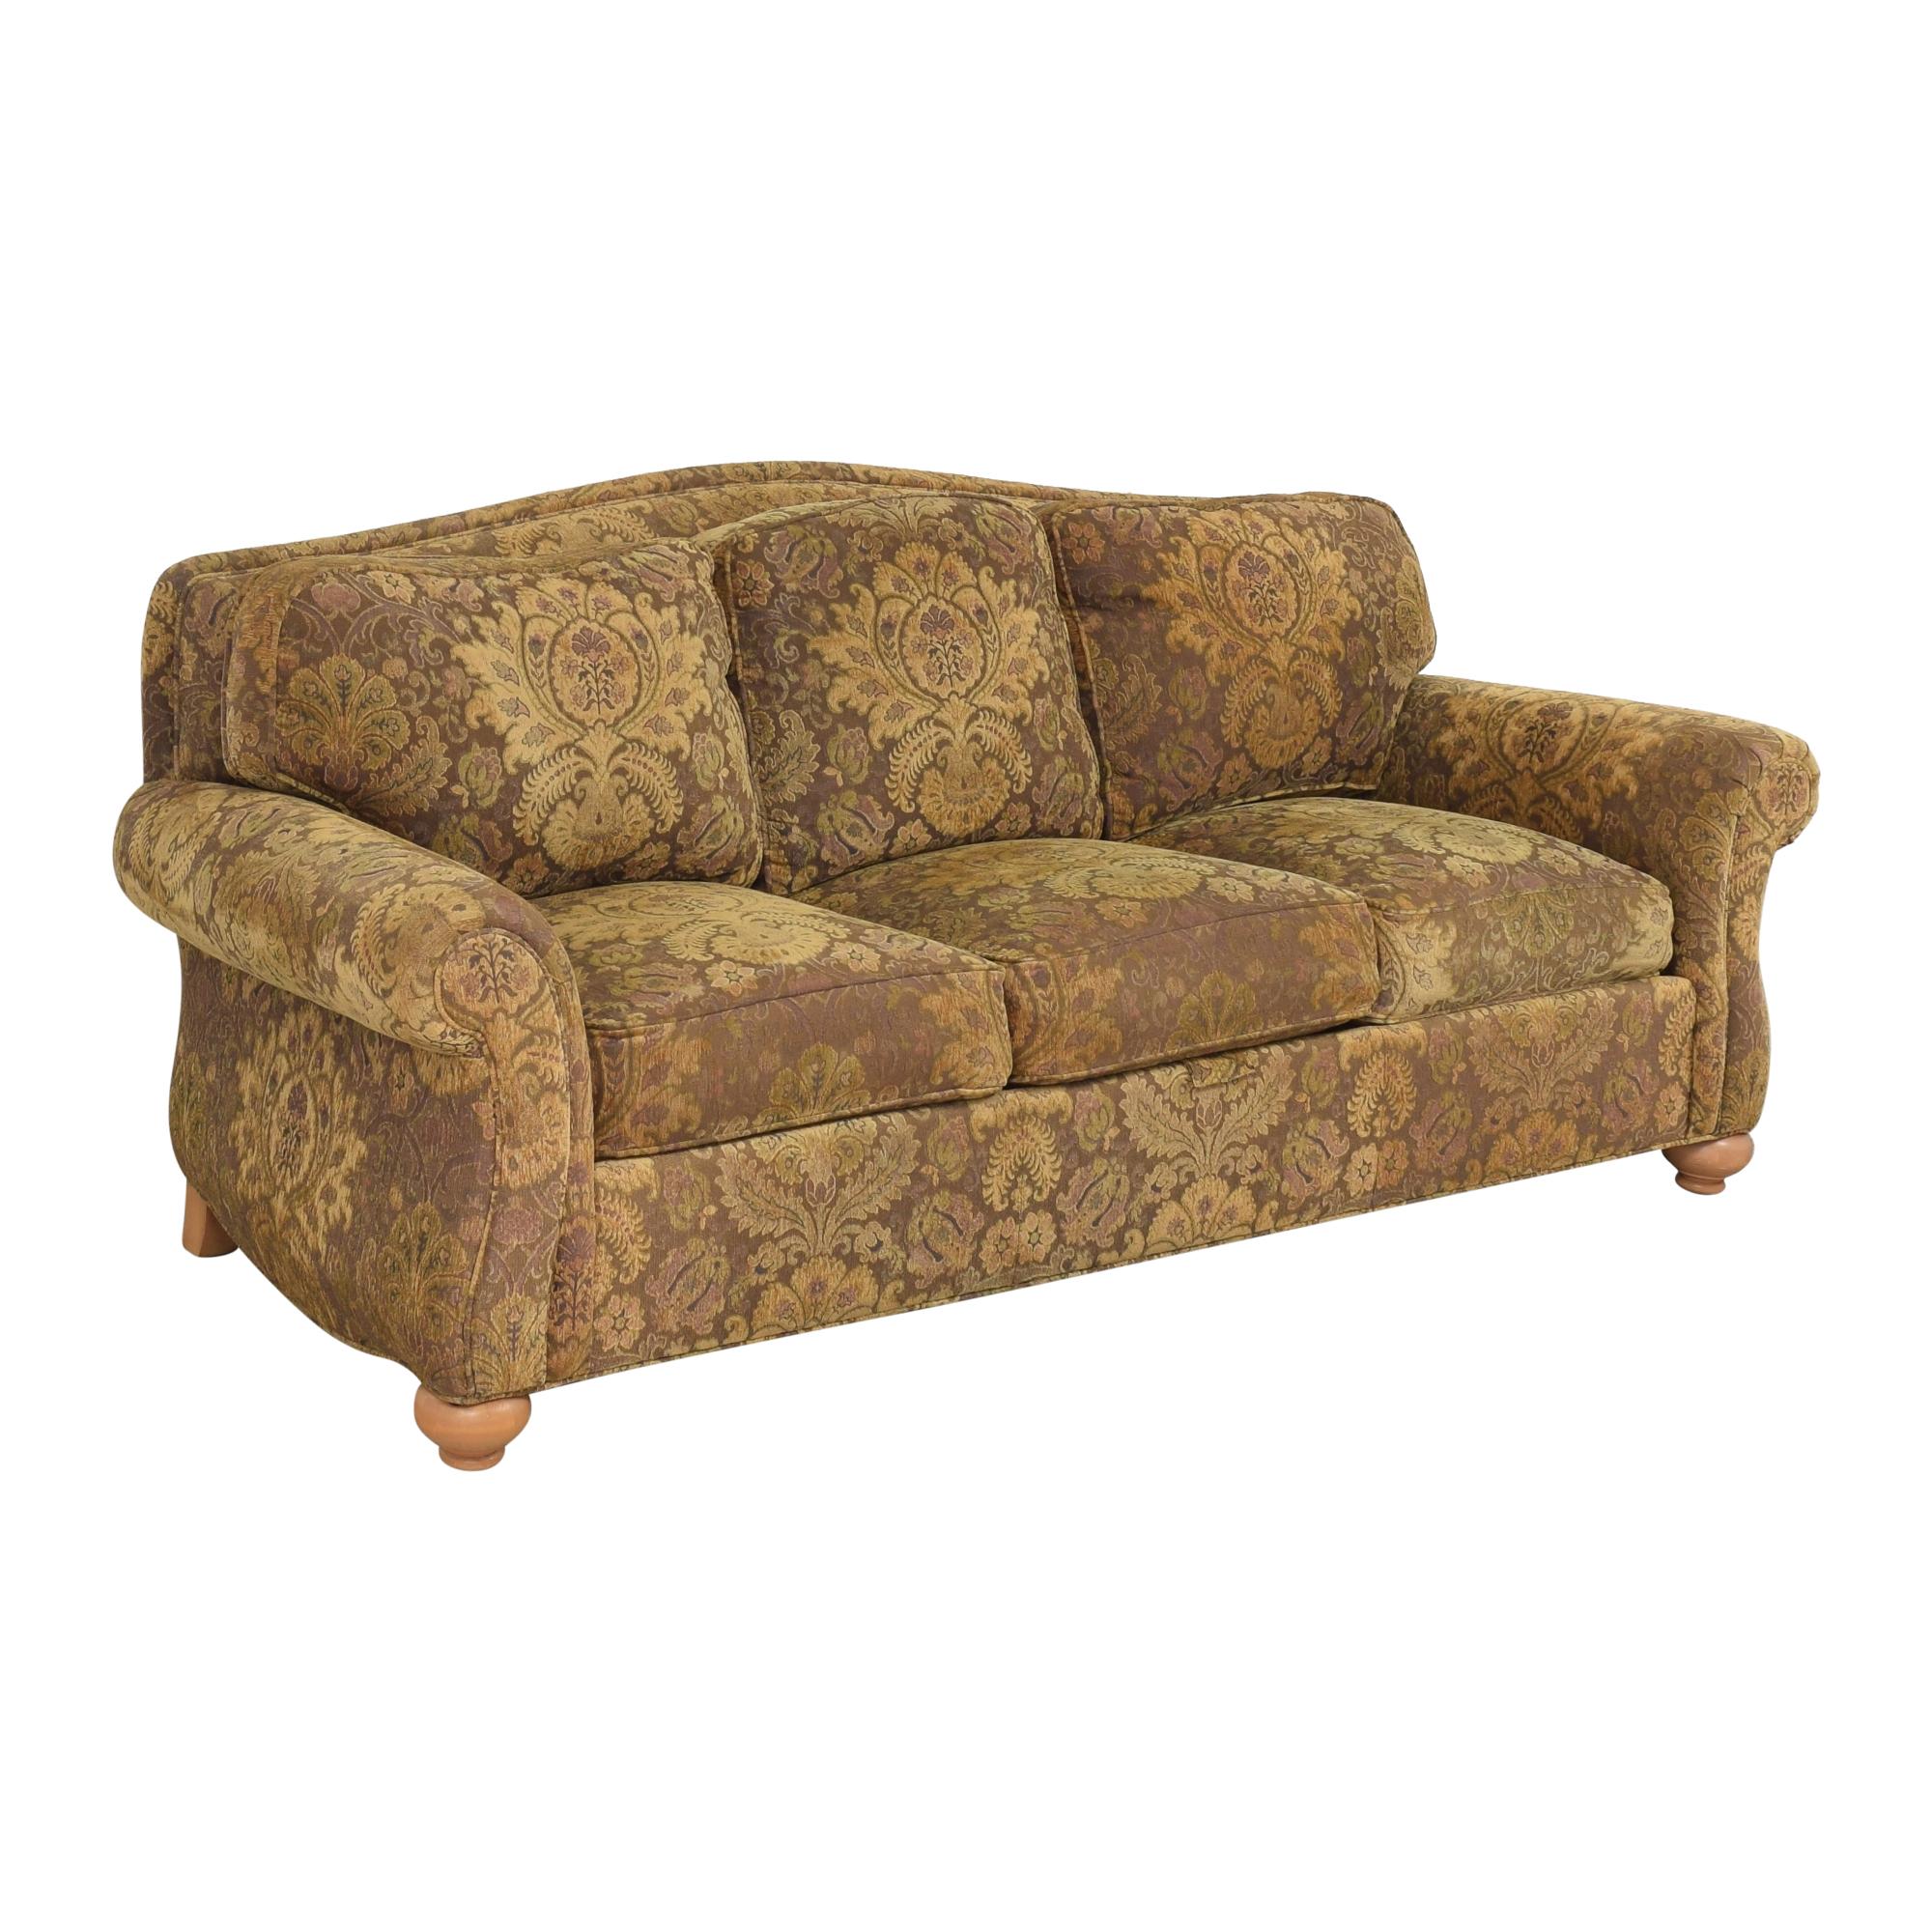 buy Ethan Allen Camel Back Sofa Ethan Allen